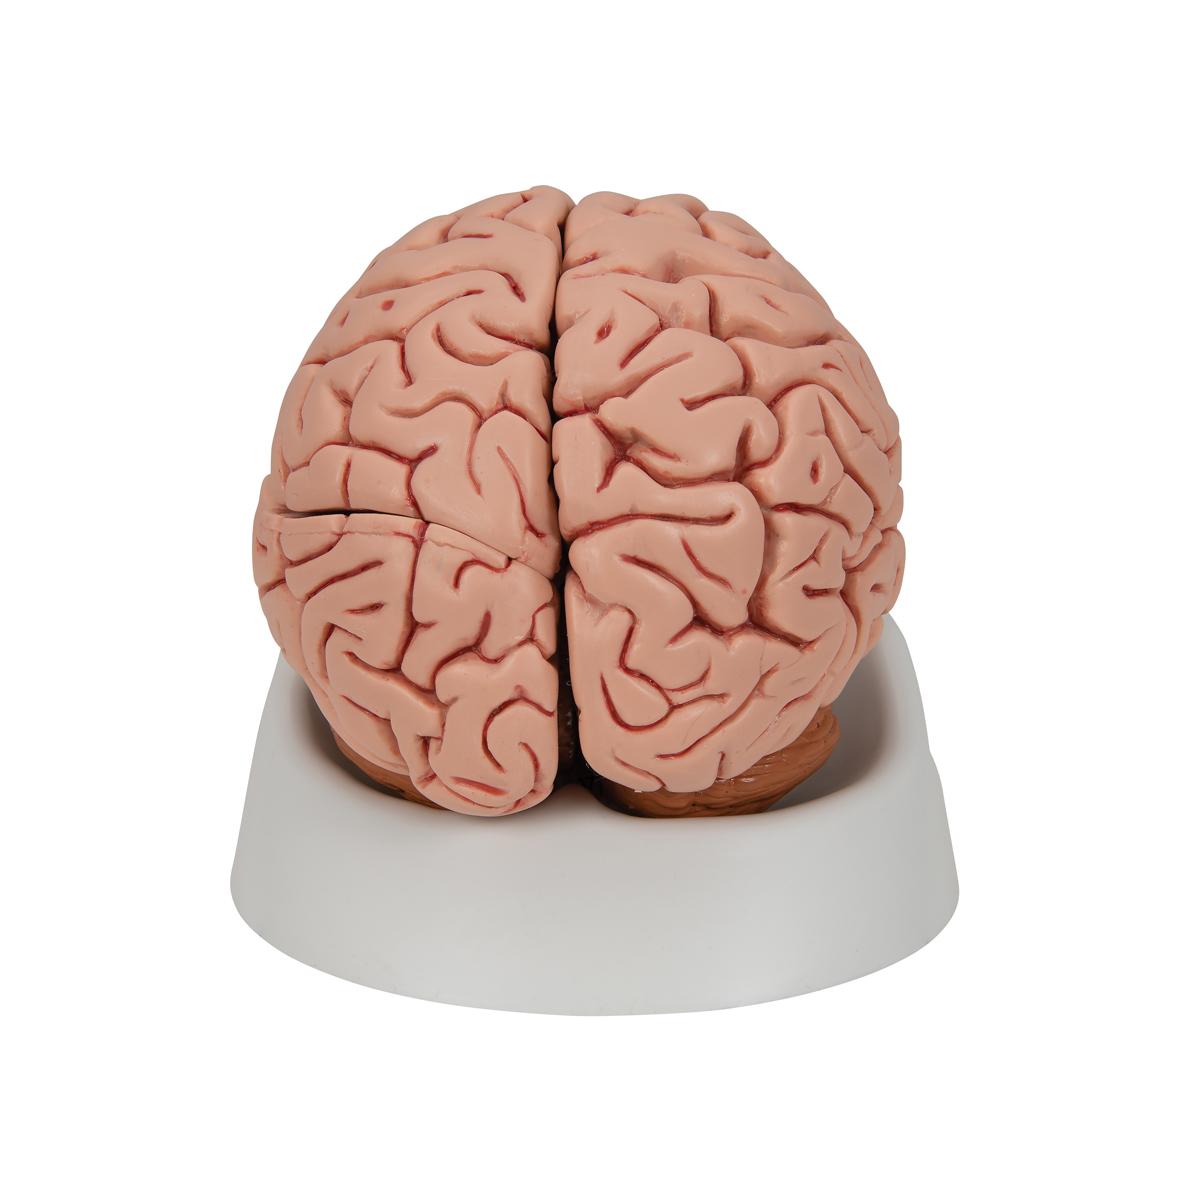 Anatomical Teaching Models Plastic Human Brain Models Classic 5